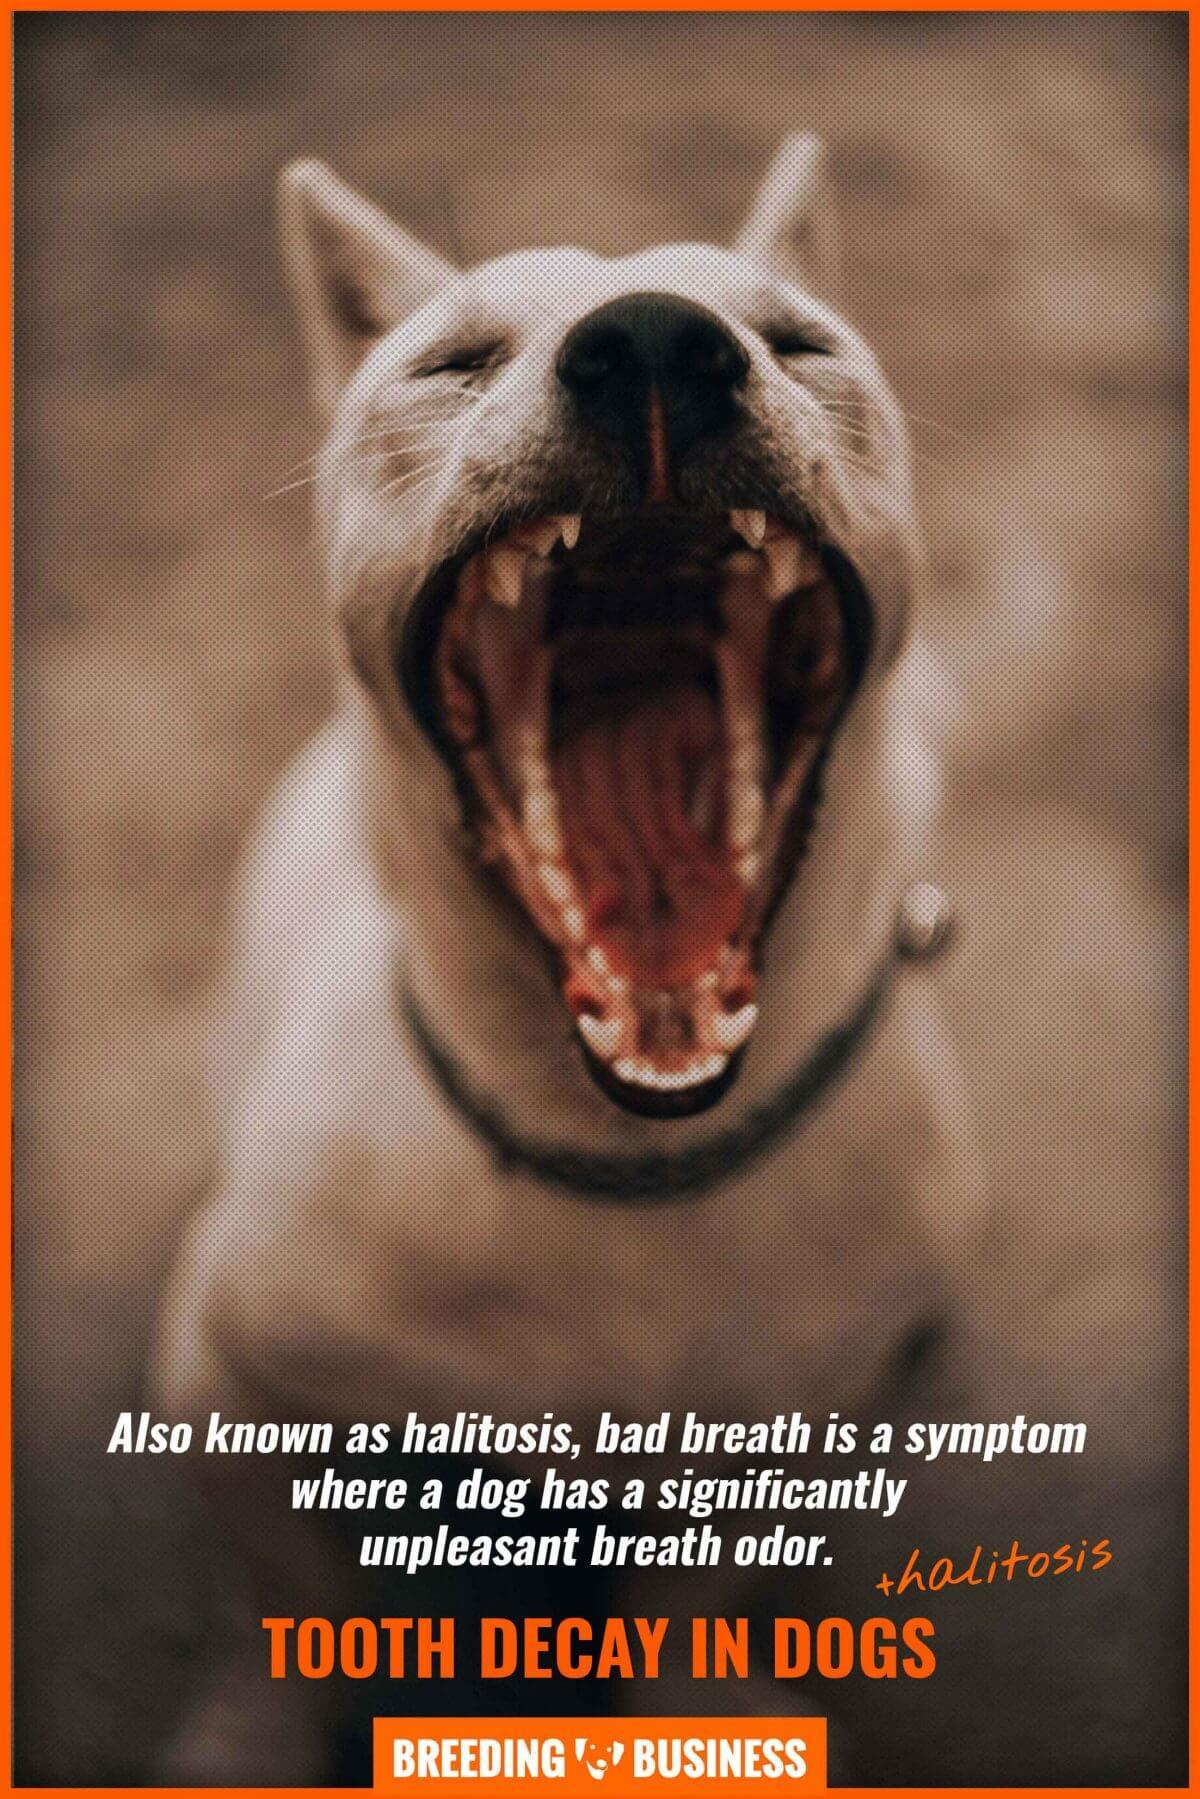 dog tooth decay and halitosis